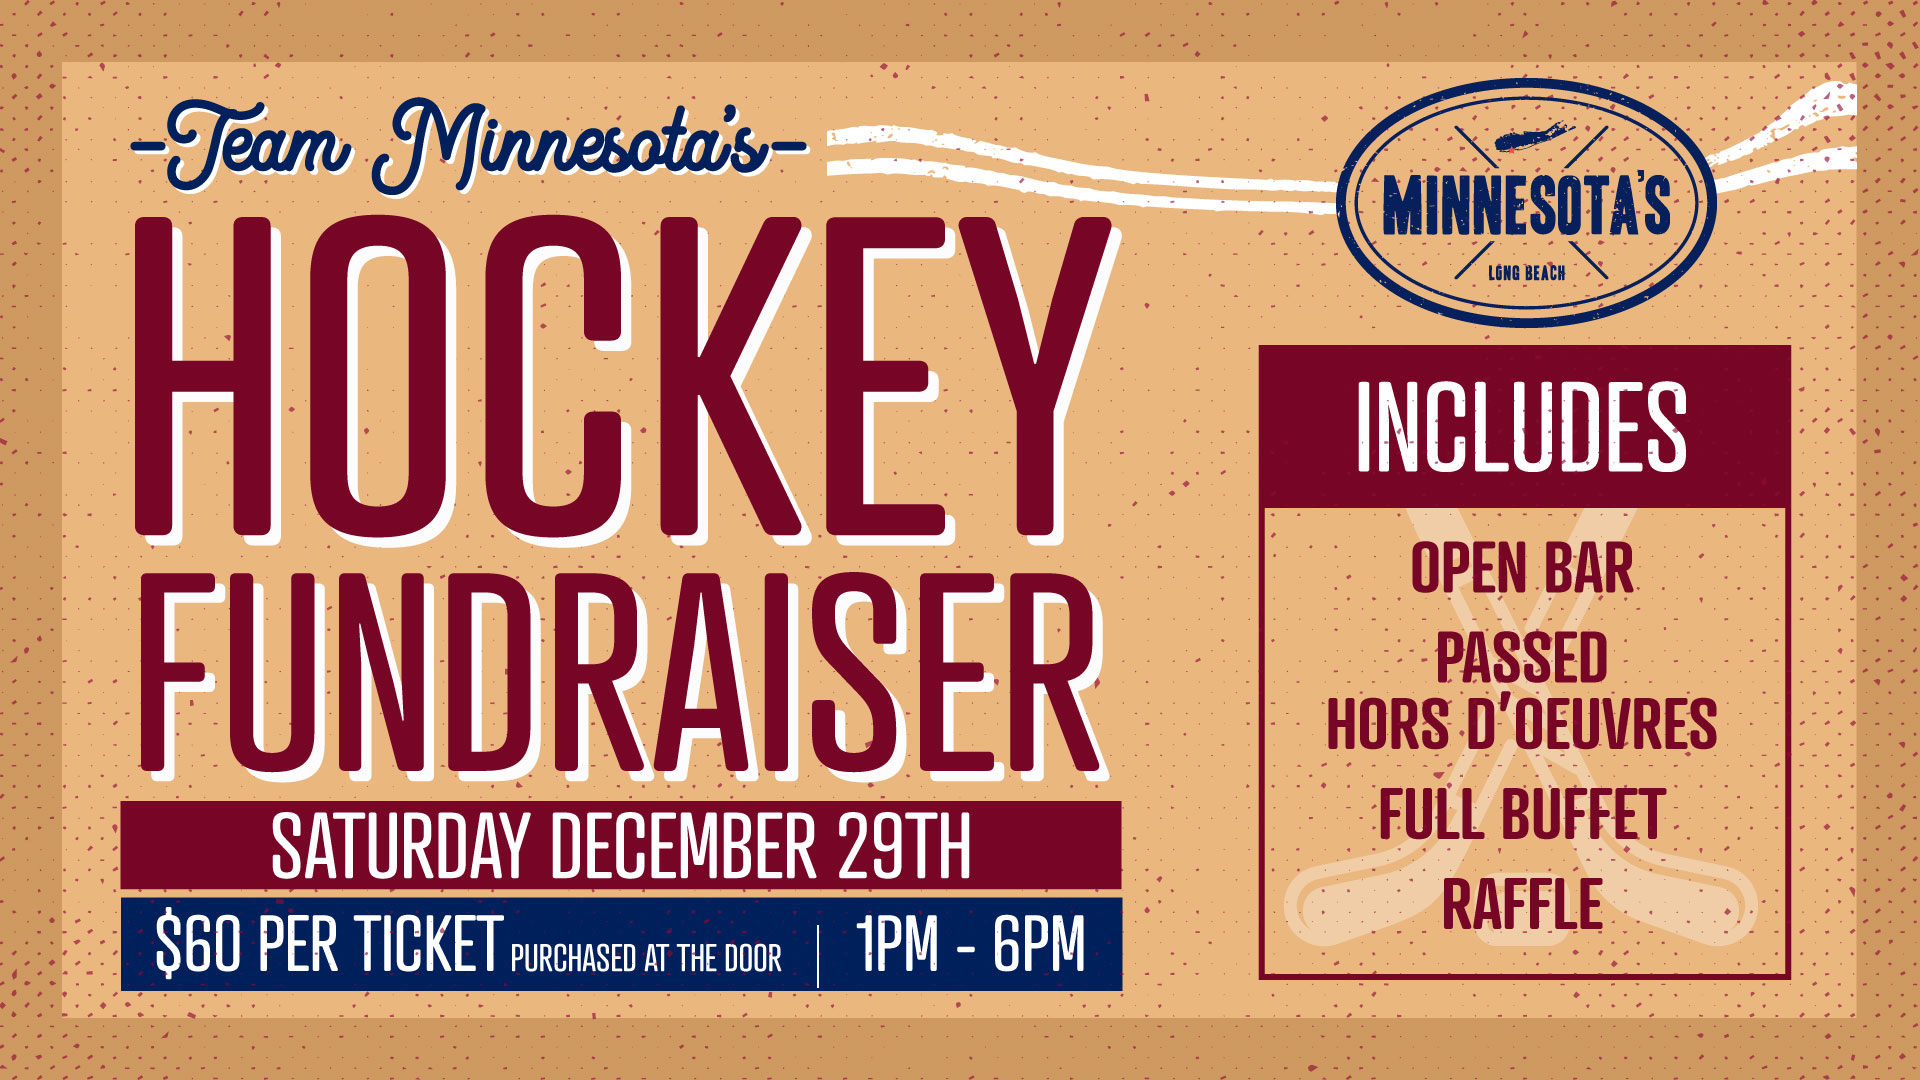 HockeyTeamFundraiser-eventcover-1920x1080 (1).jpg